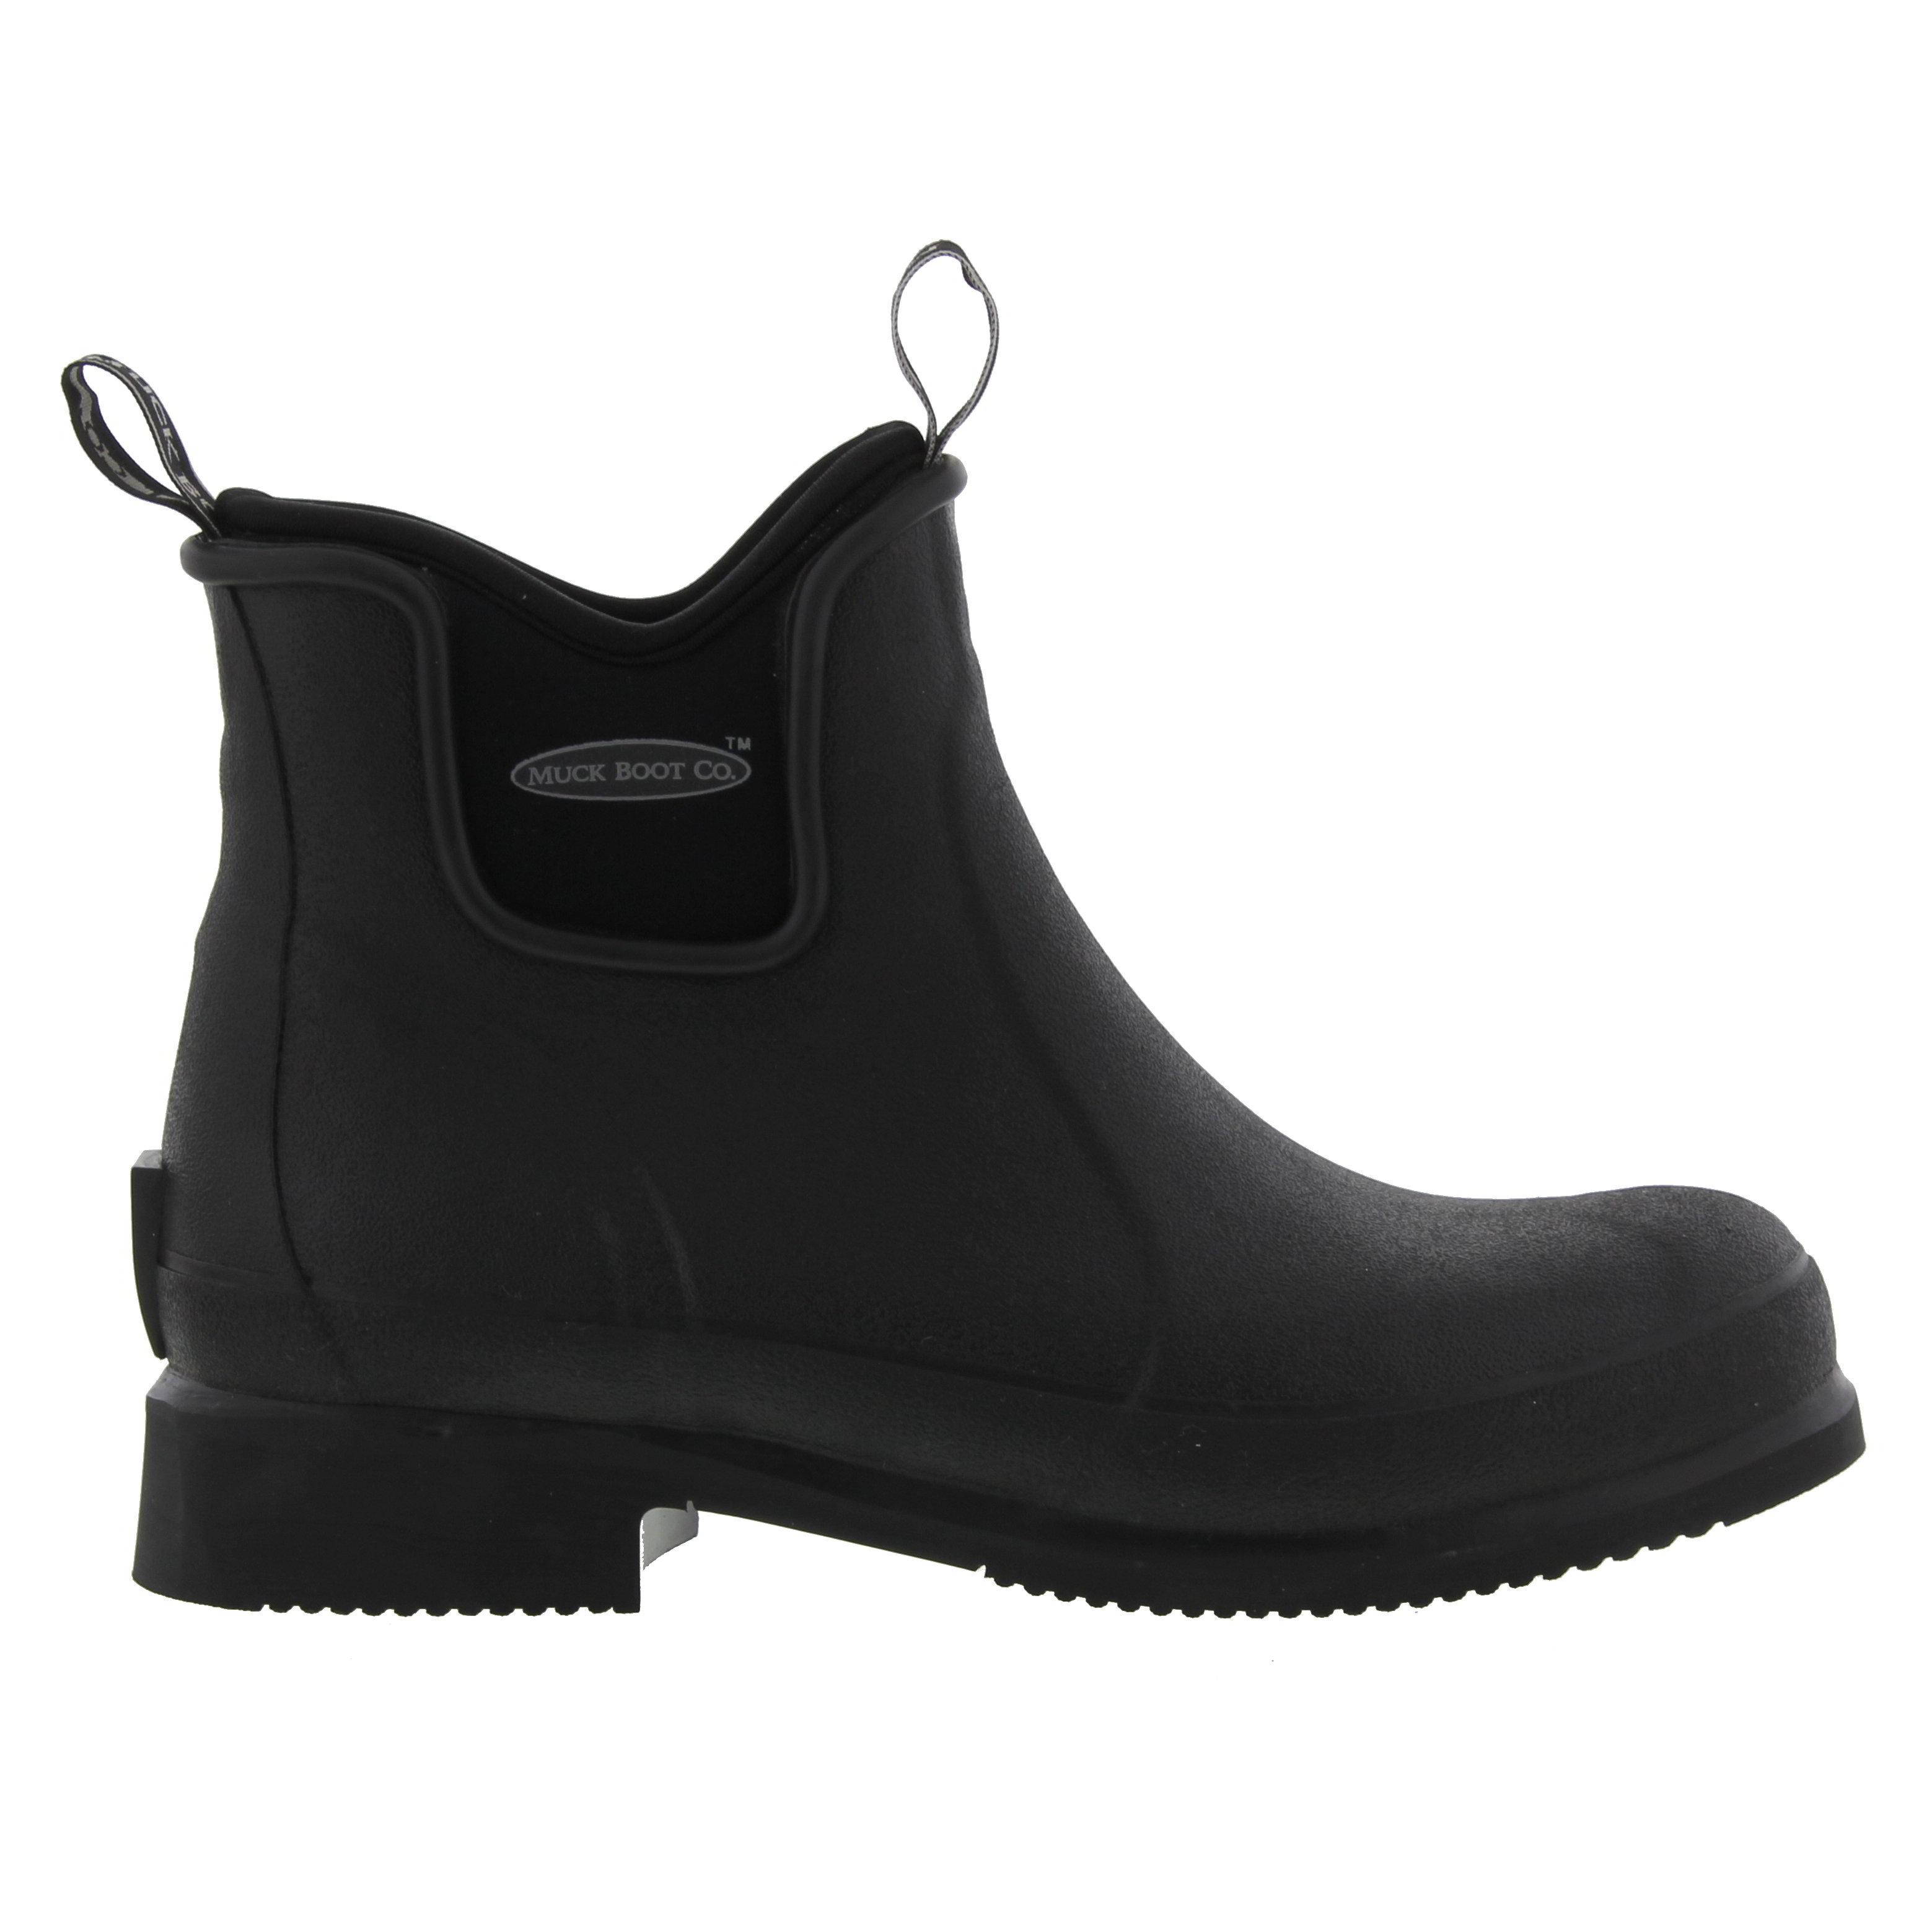 Muck Boots Wear Womens Short Ankle Wellington Yard Chelsea Boots ...